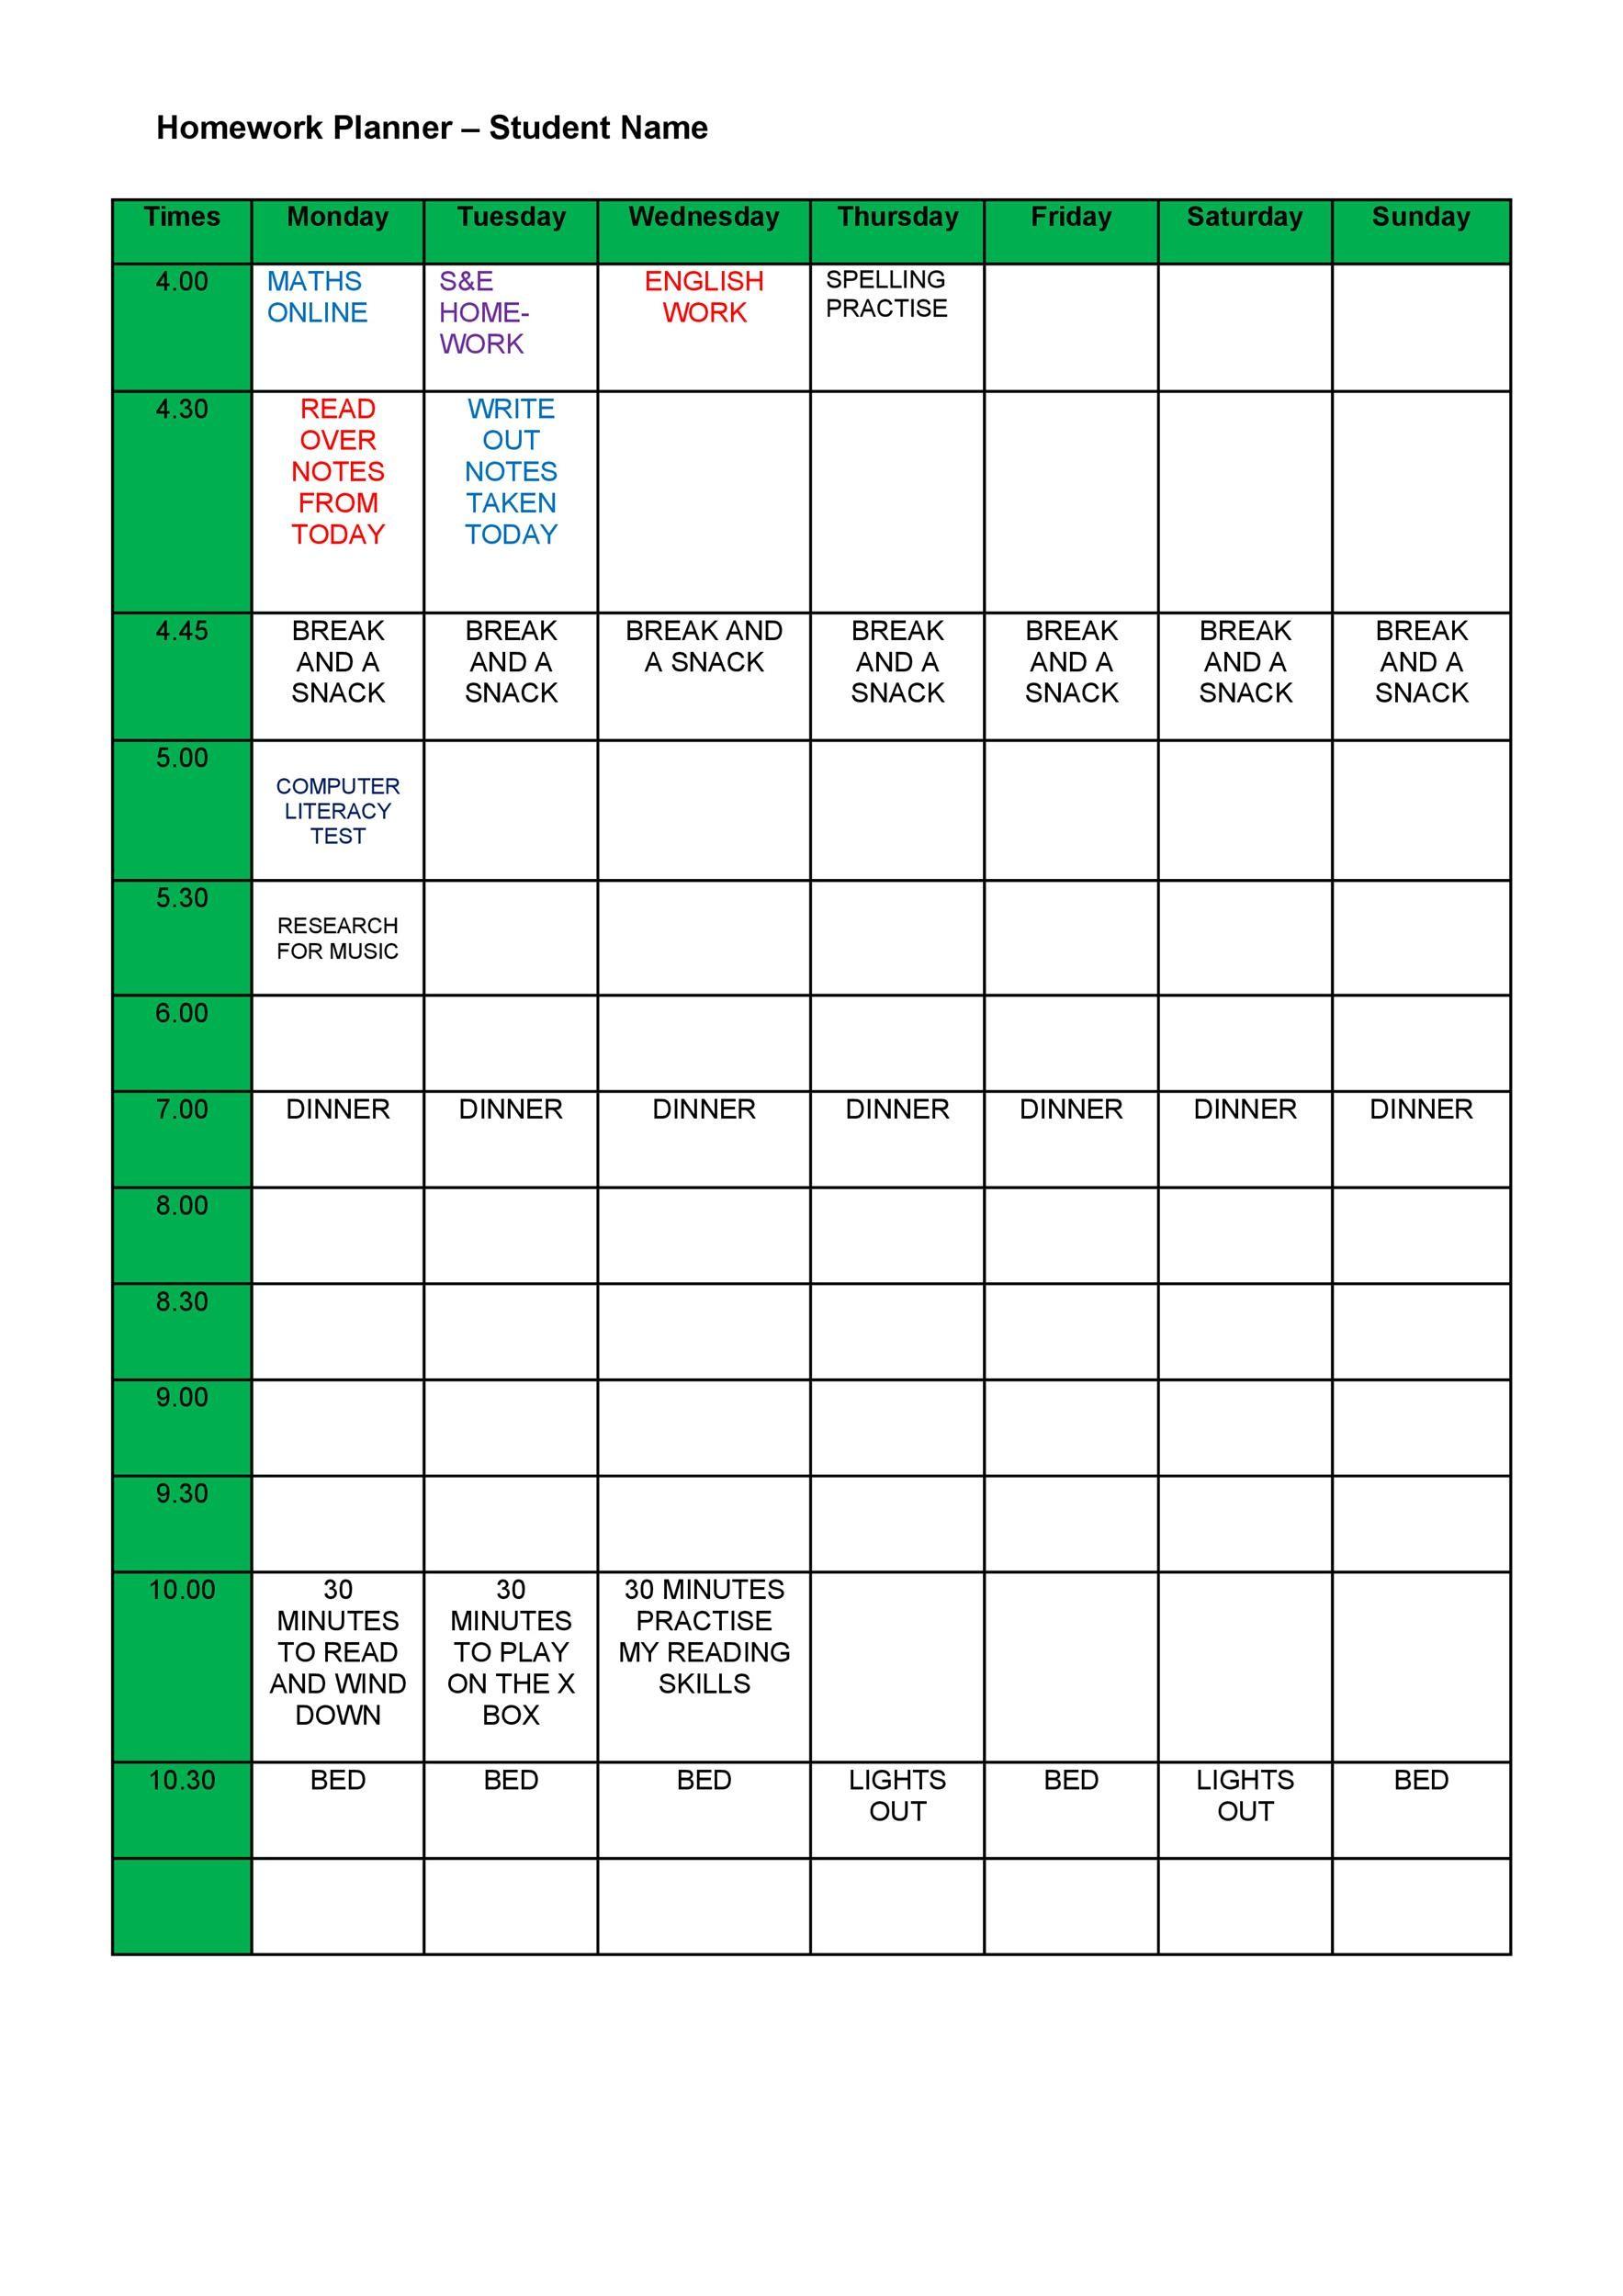 Free homework planner 17